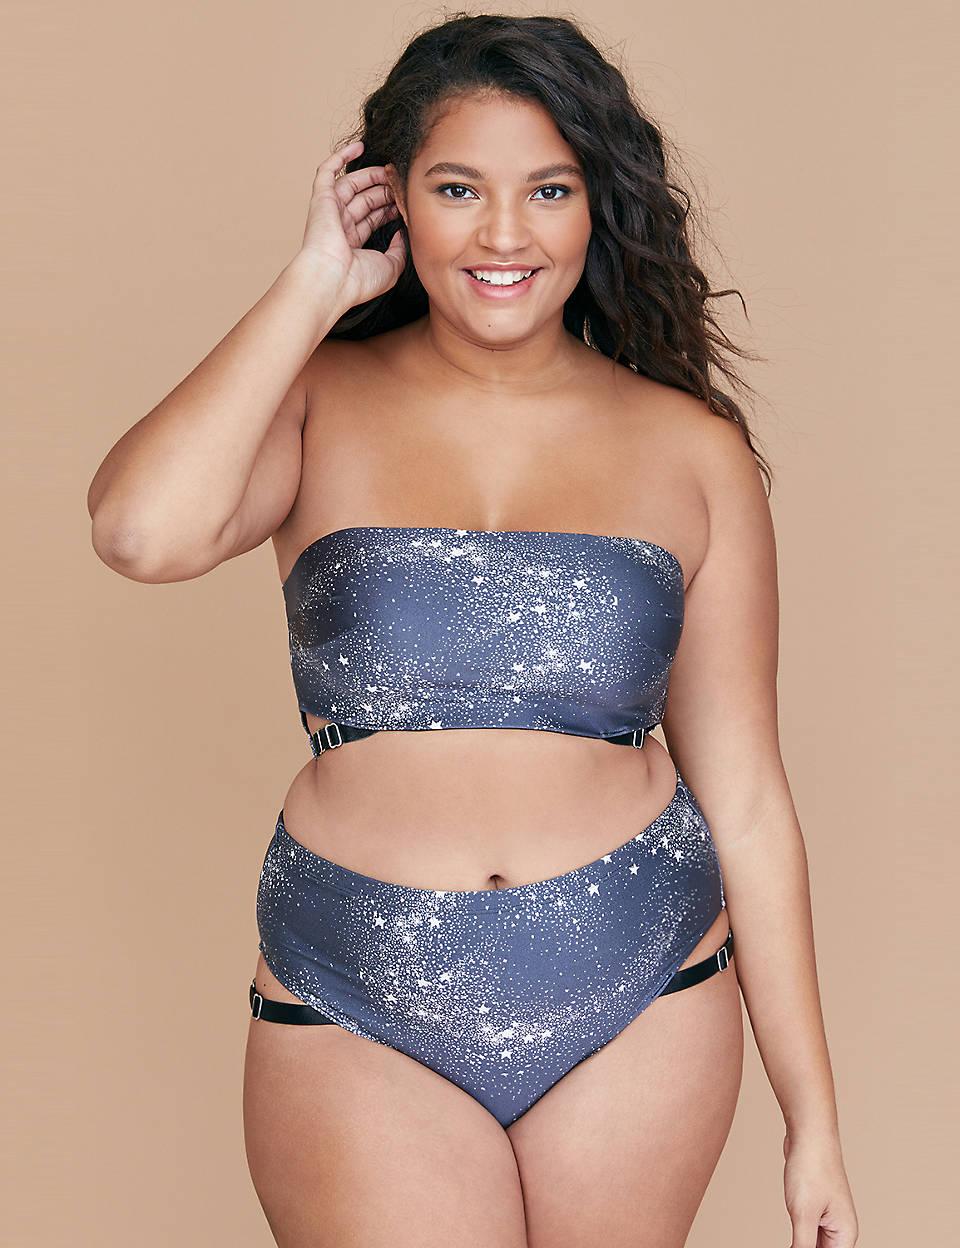 99bb978d4371d Swim Bikini Top with Built-In Bandeau Bra - Shimmer Star Print